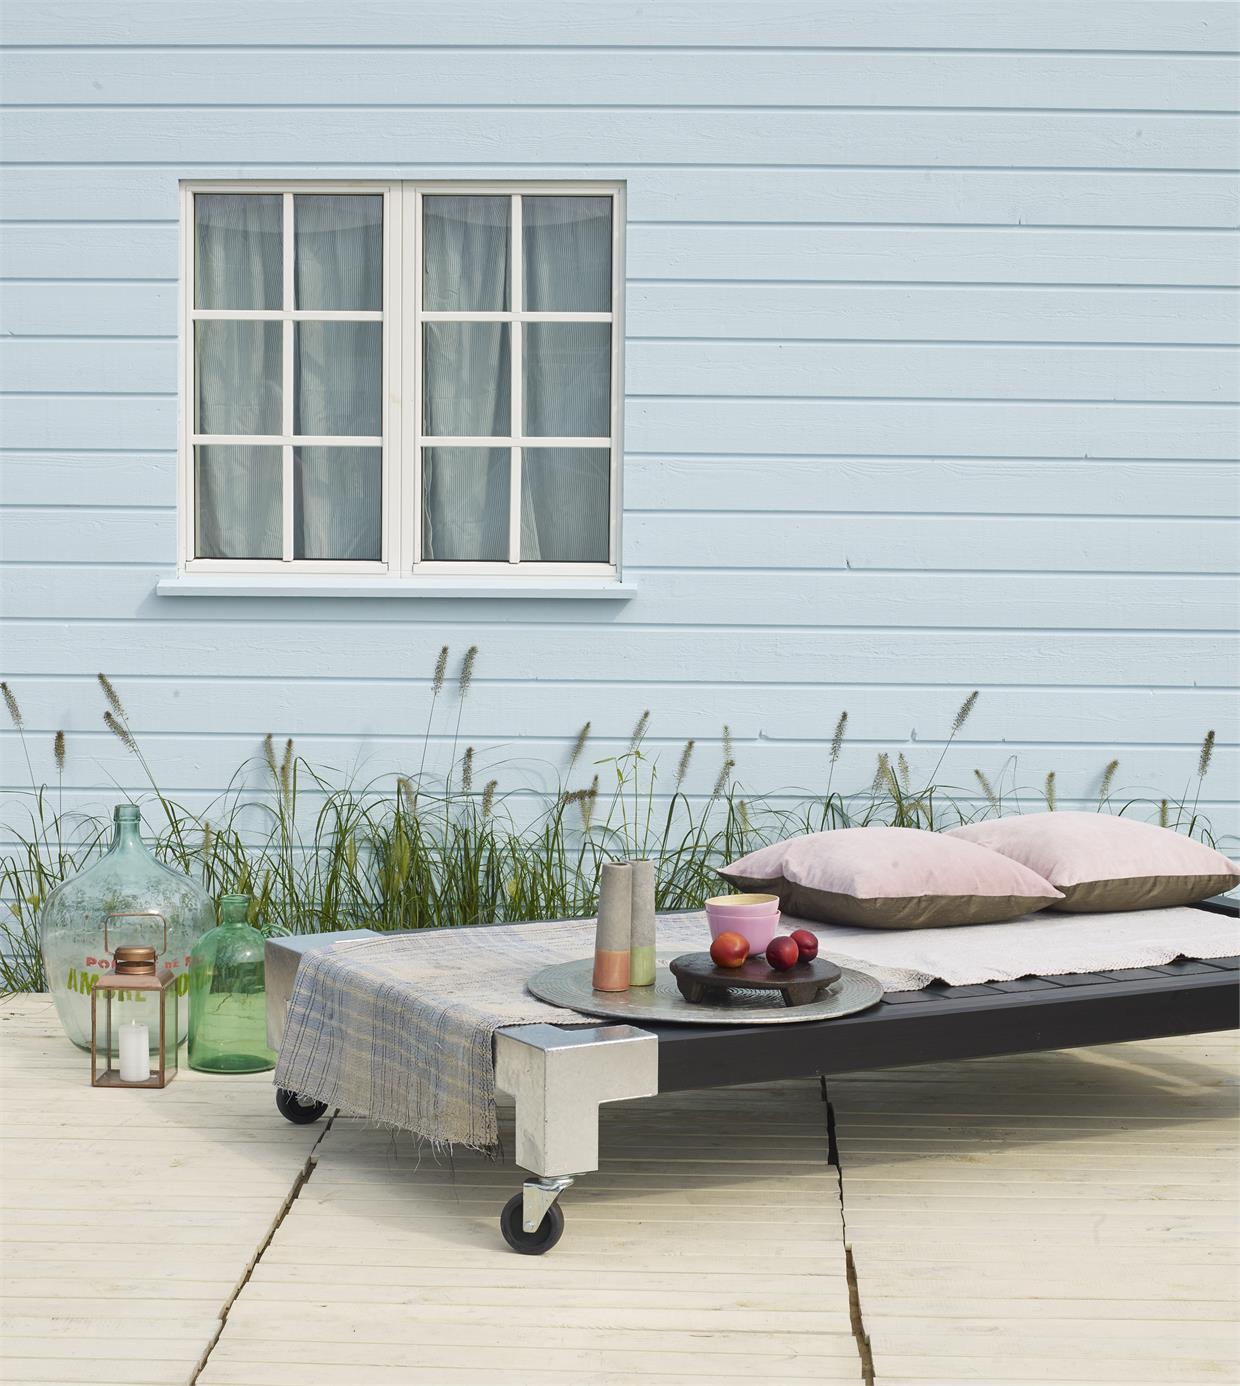 garten im quadrat holz liege cubic modernes gartenbett. Black Bedroom Furniture Sets. Home Design Ideas